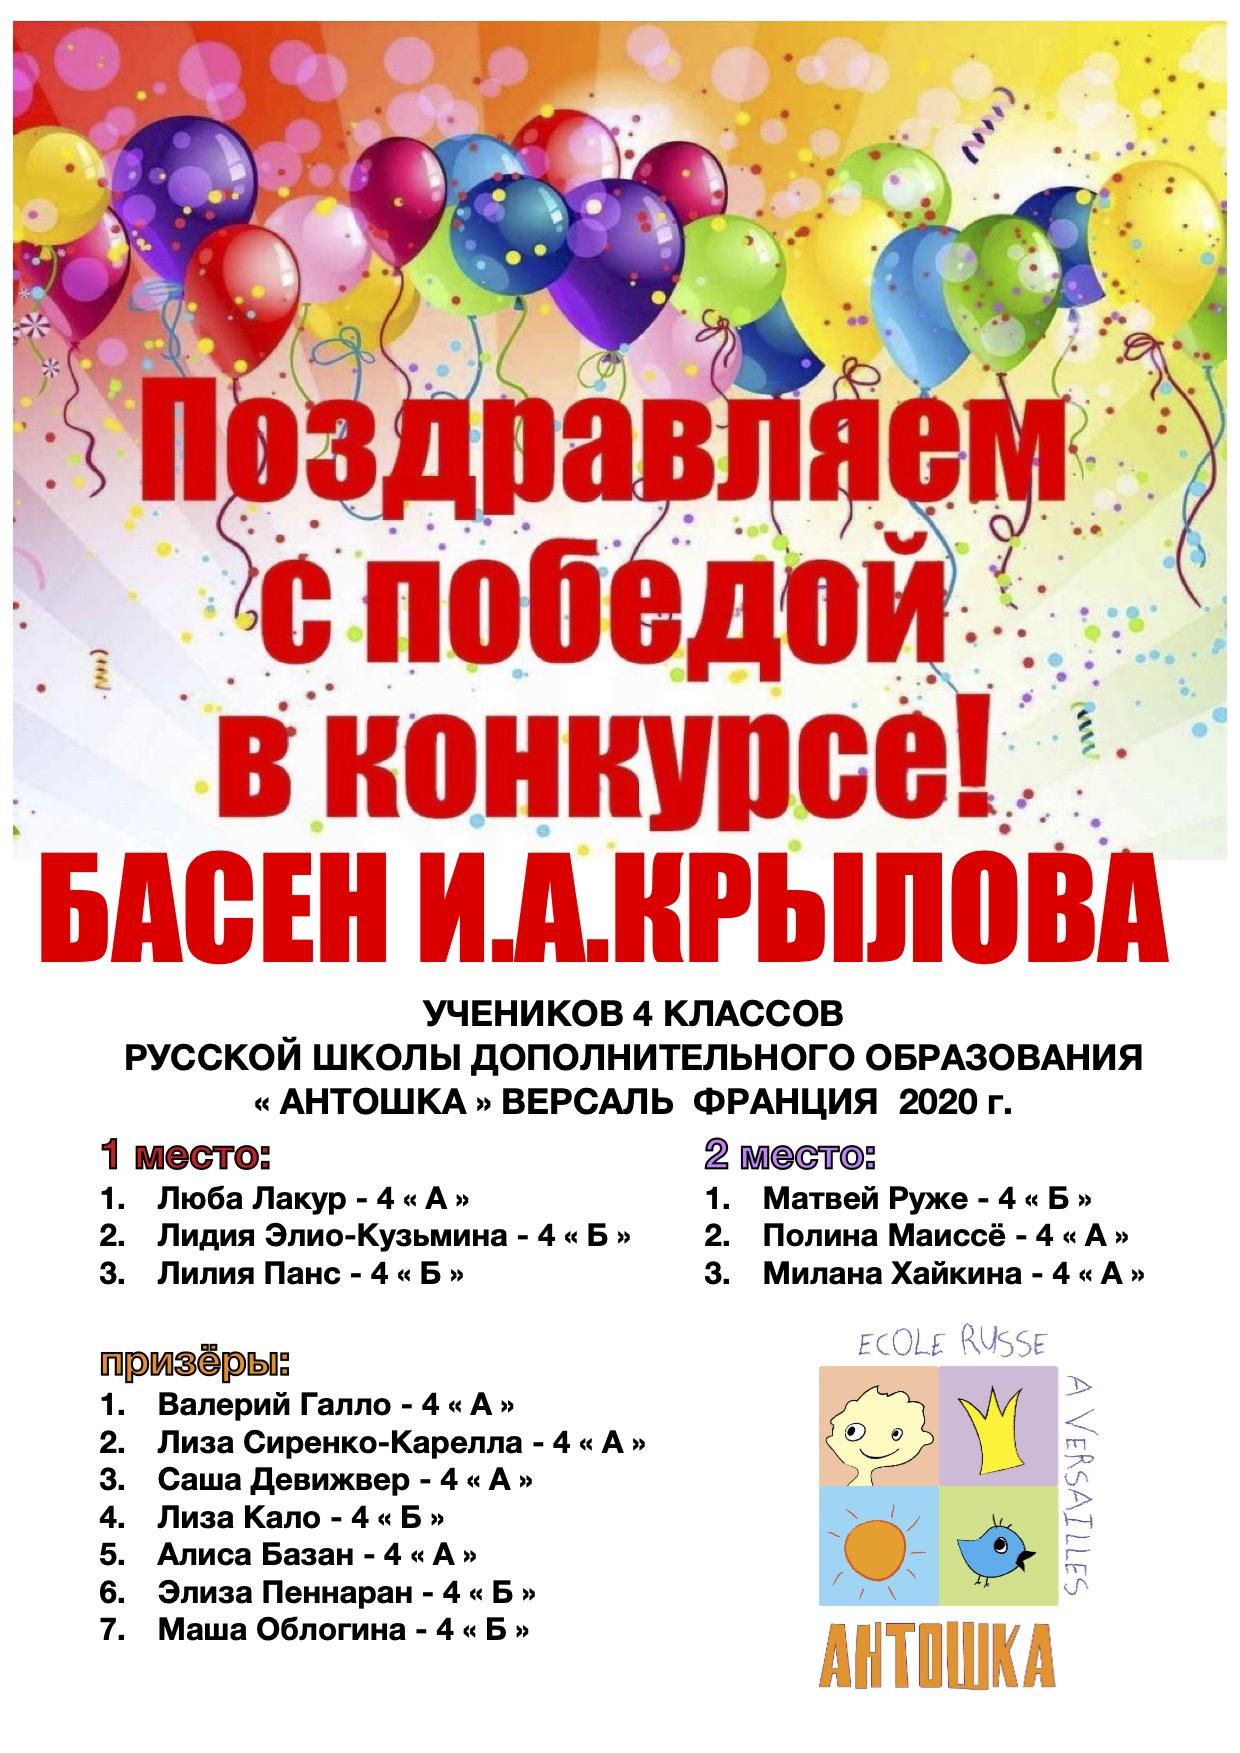 Read more about the article Победители конкурса БАСЕН И.Крылова